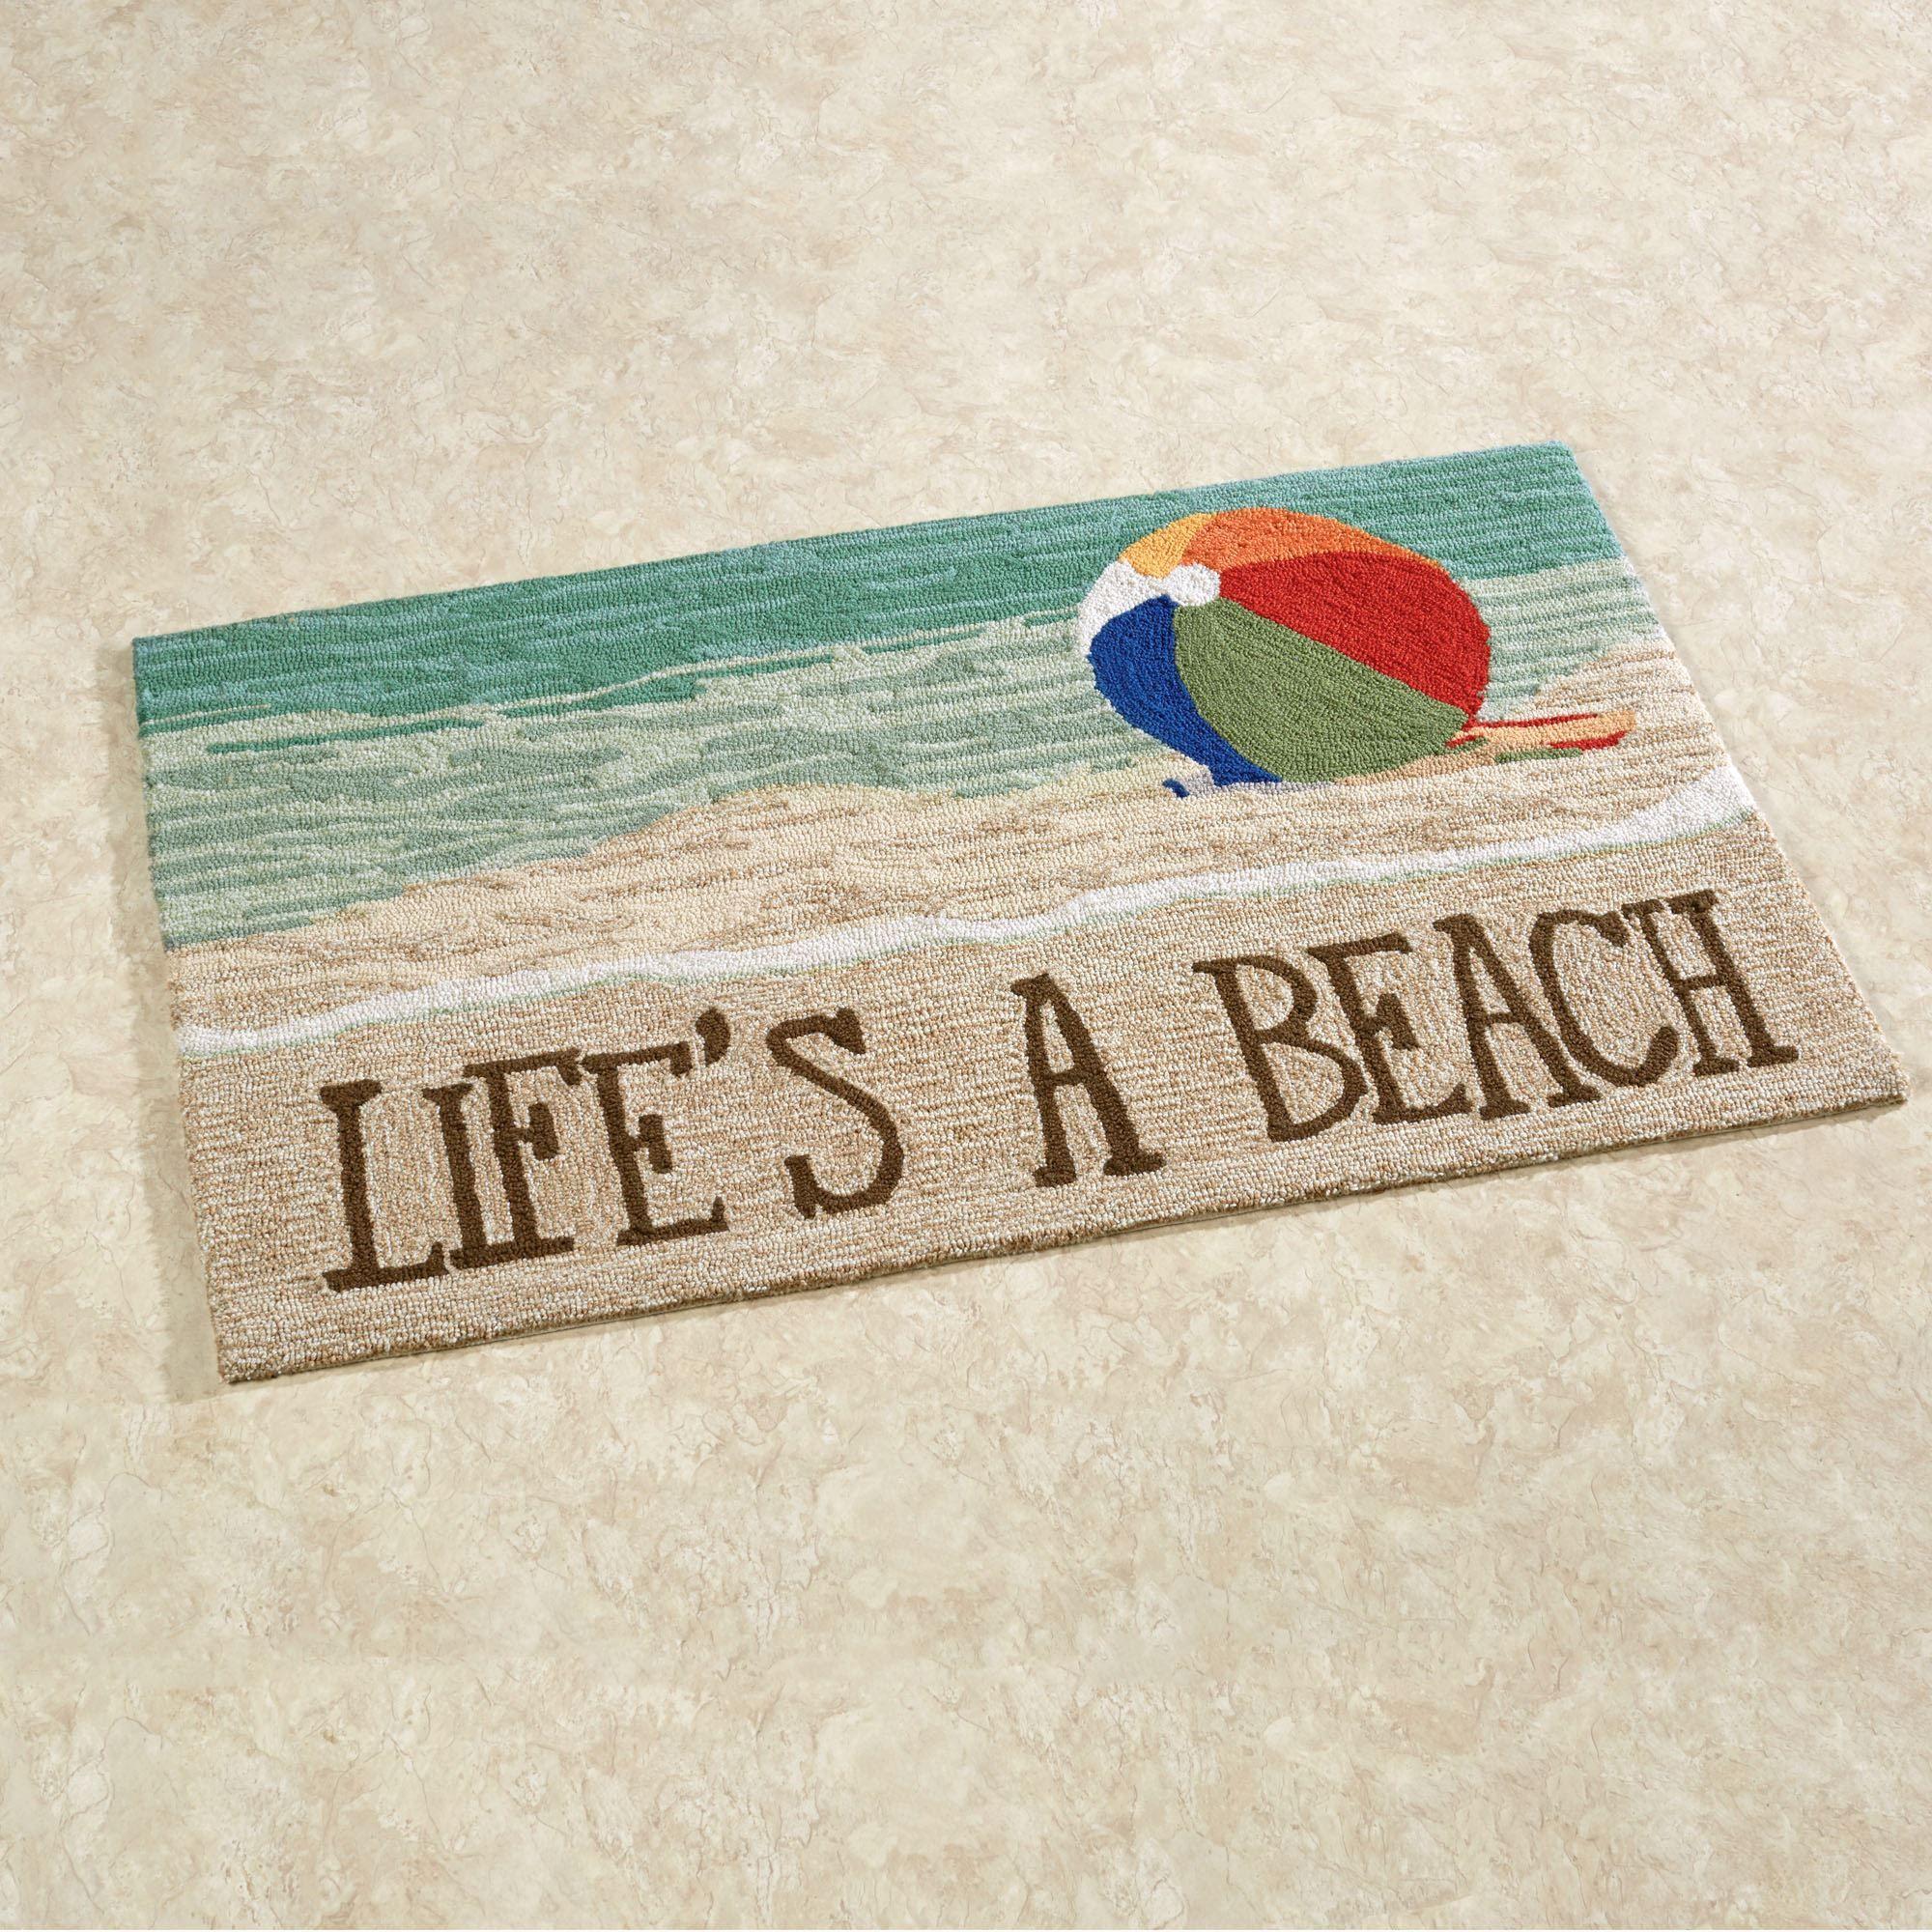 Beach Sand Area Rug: Lifes A Beach Indoor Outdoor Rugs